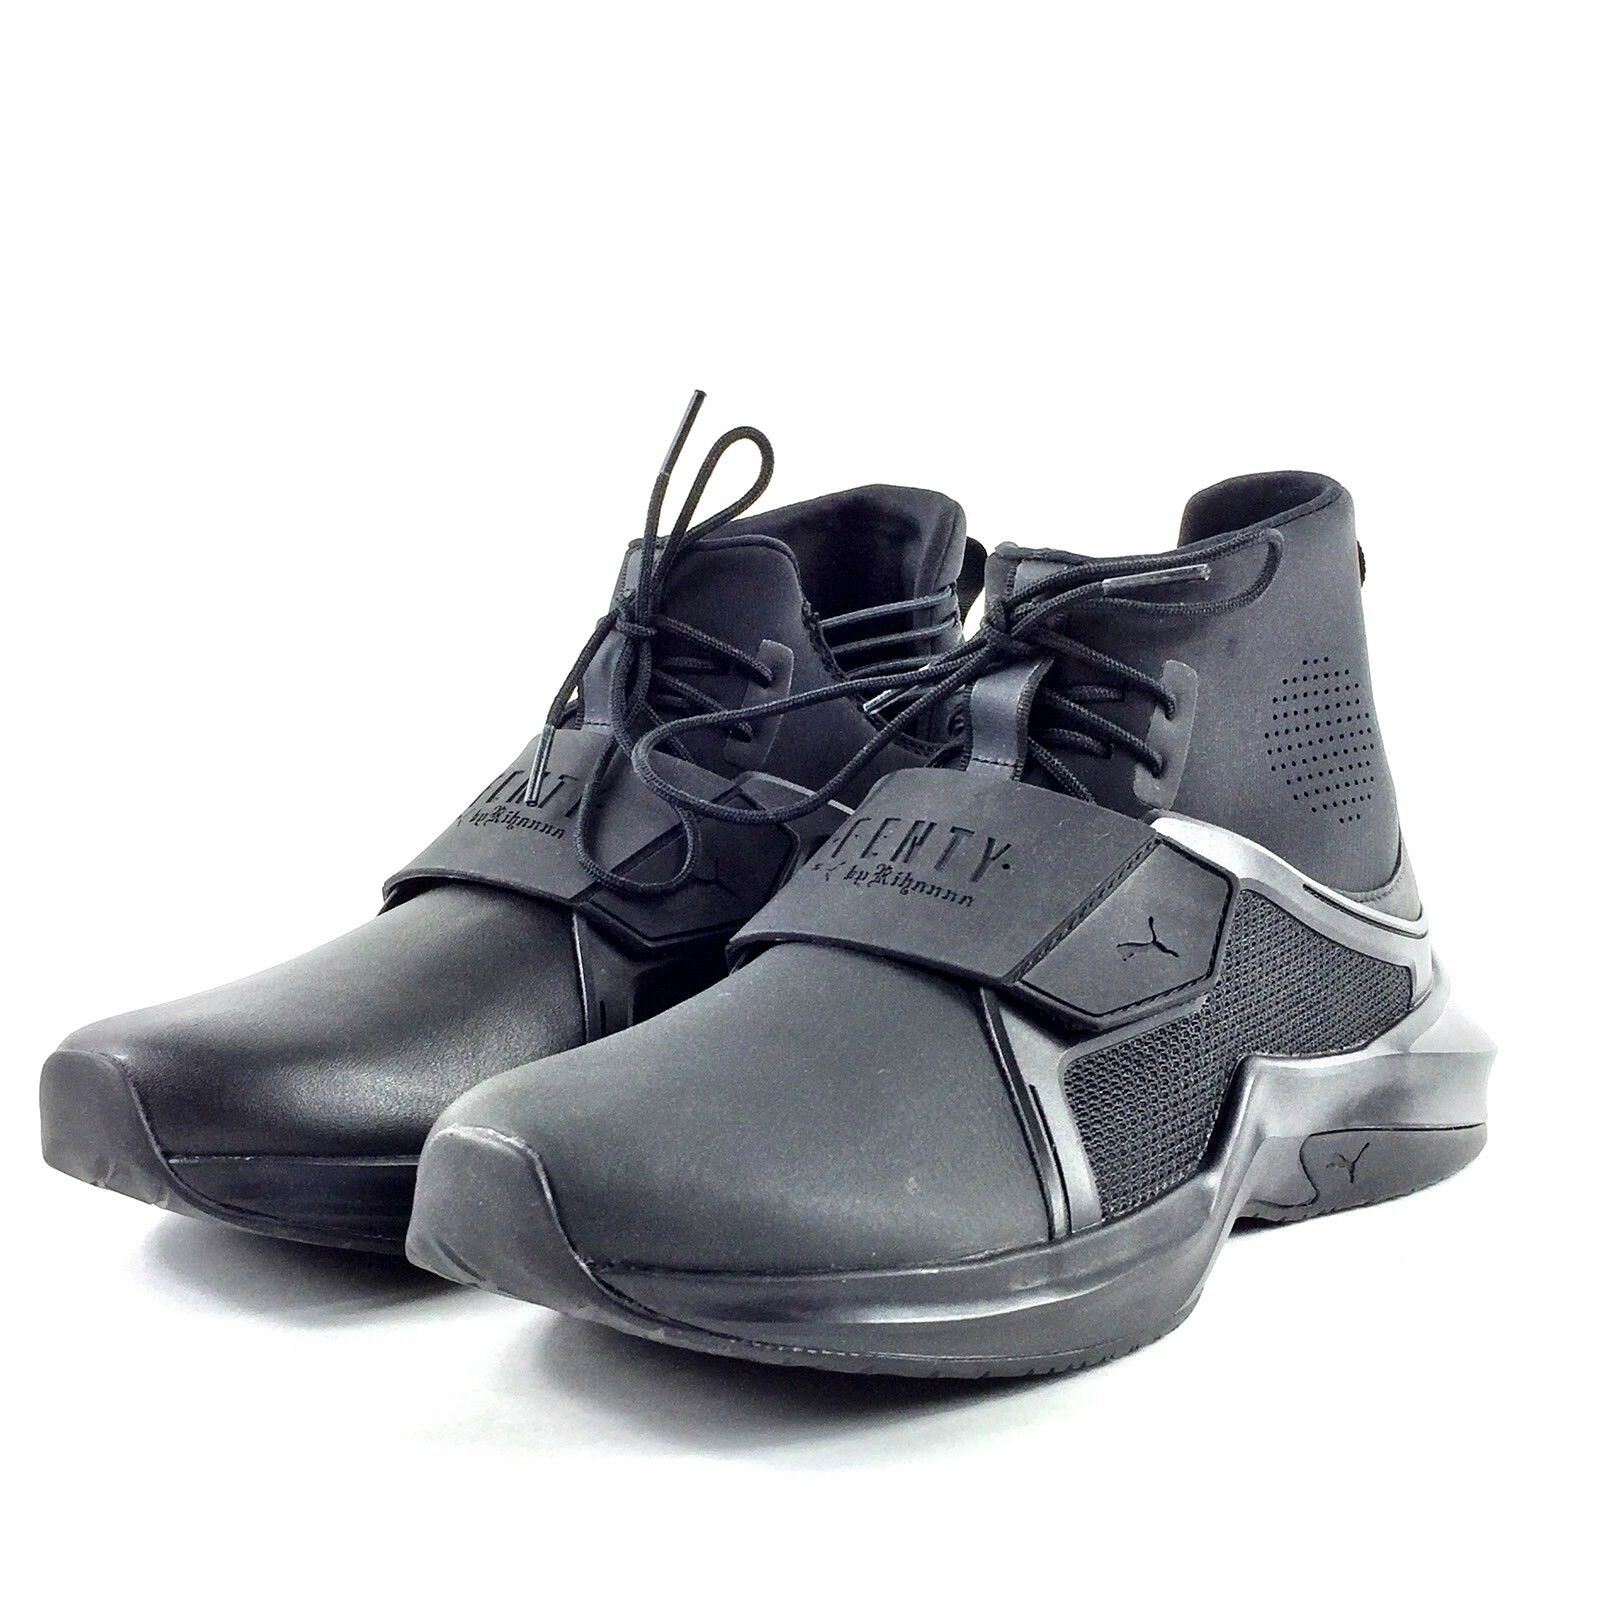 Puma X Rihanna Fenty Trainer Hi Femme Casual chaussures noir 190398 01 Sz